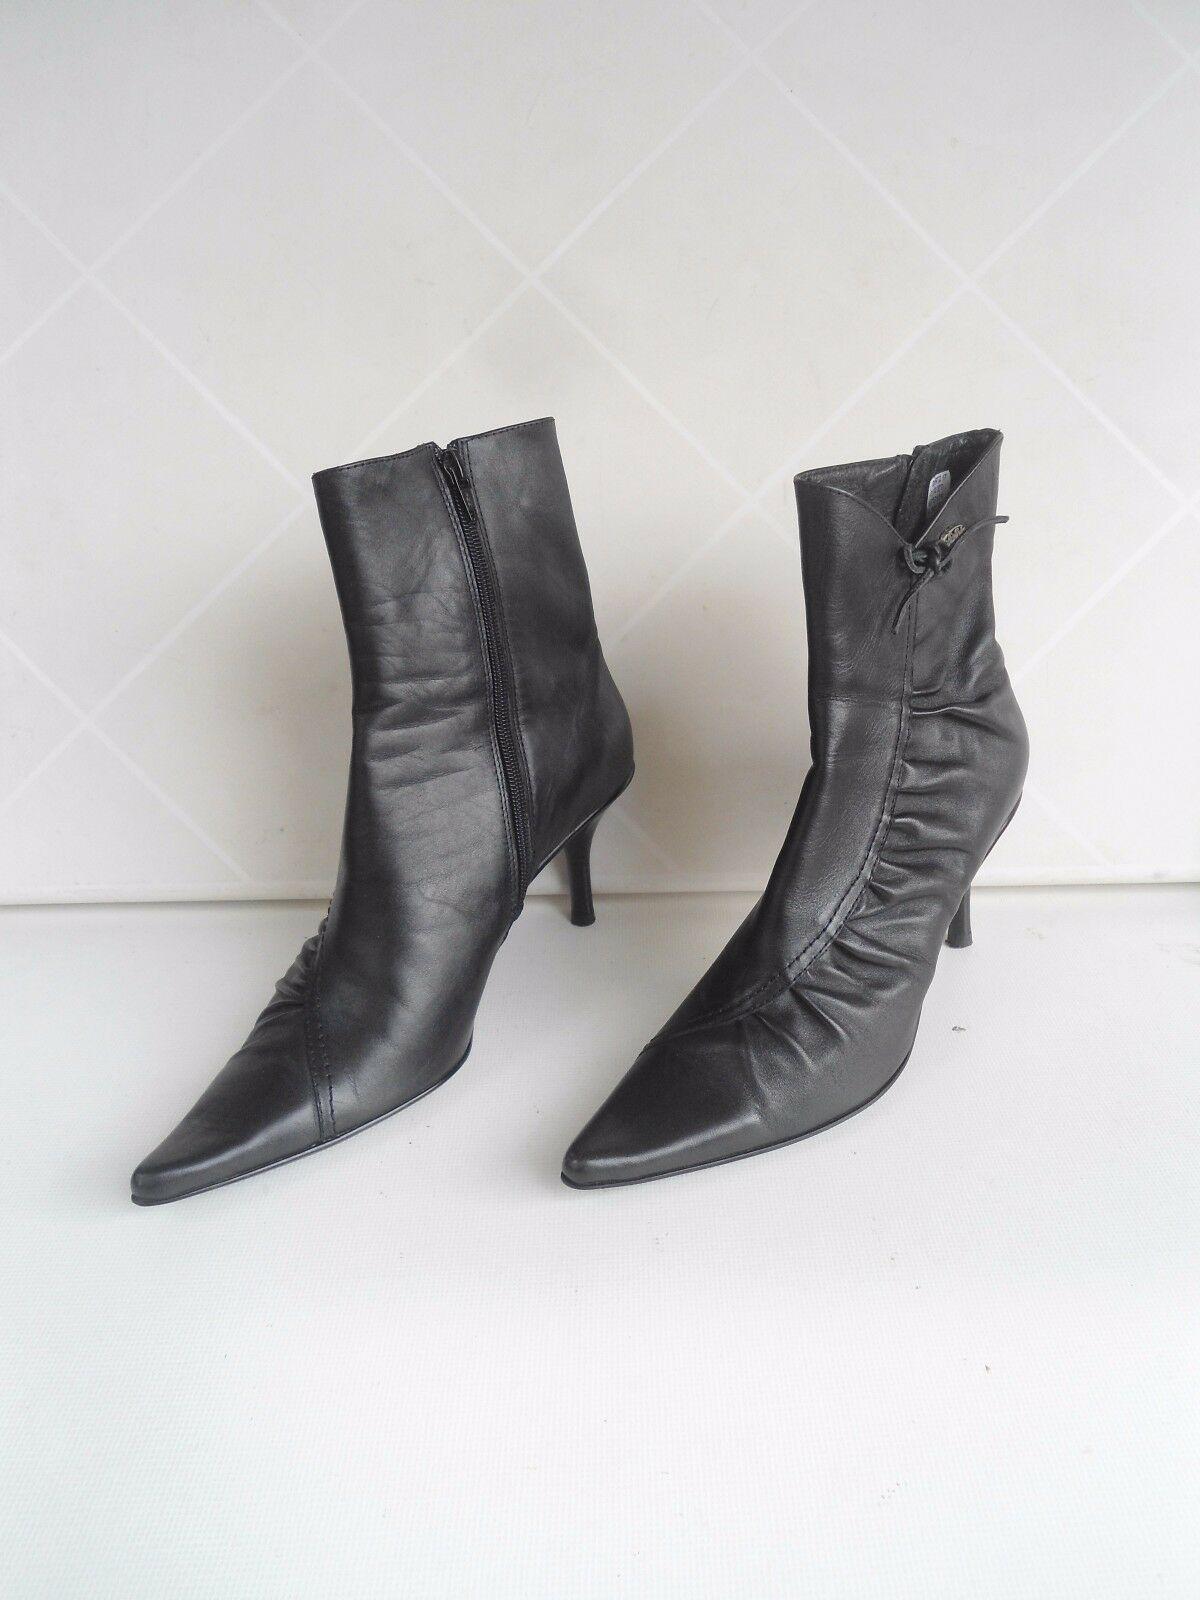 Damenschuhe von BUFFALO LONDON, Neu echtes Leder, schwarz, G:38, Neu LONDON, 3f9d3c